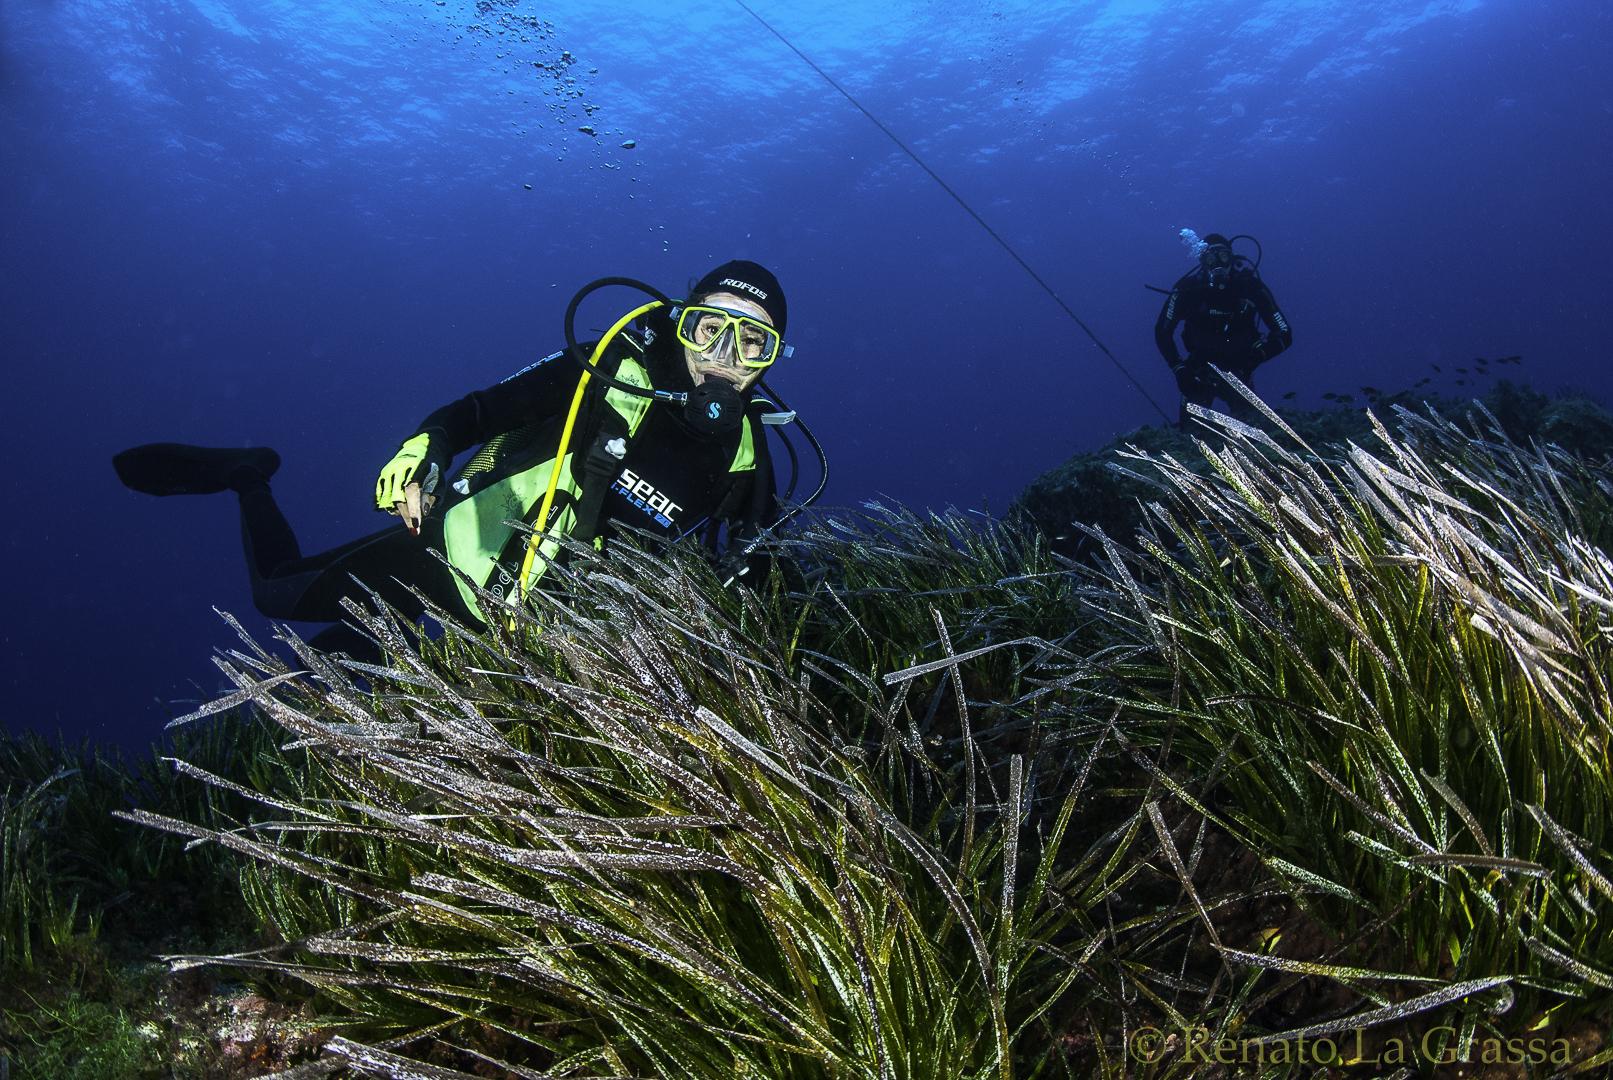 Videogallery – Crociera subacquea Isole Egadi – Sett.-Ott. 2020